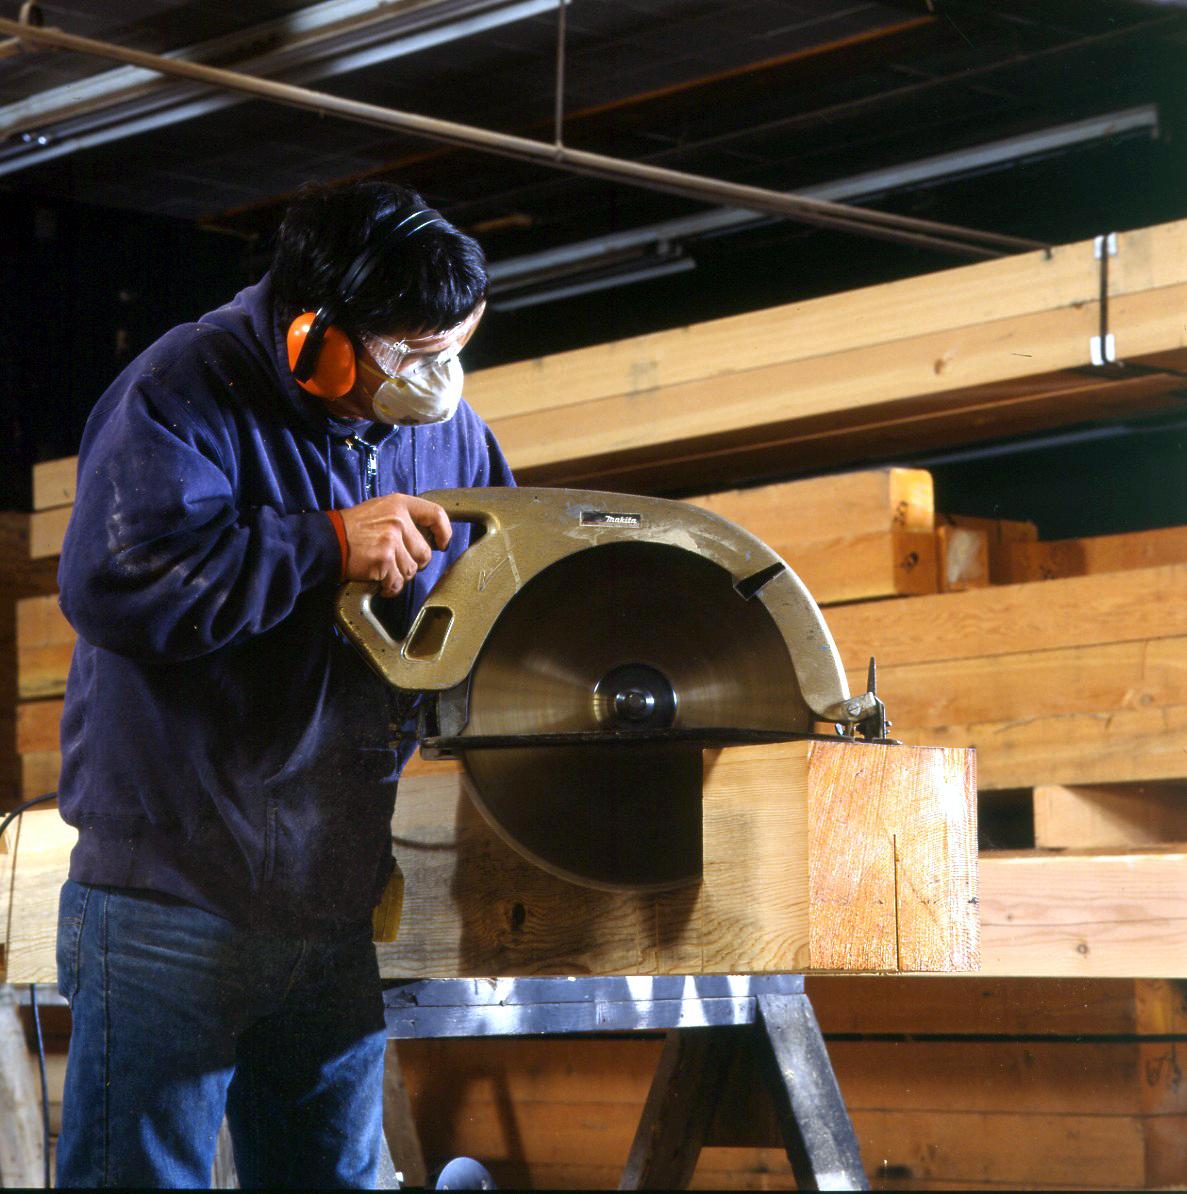 File:Timber Framing Circular Saw.jpg - Wikimedia Commons